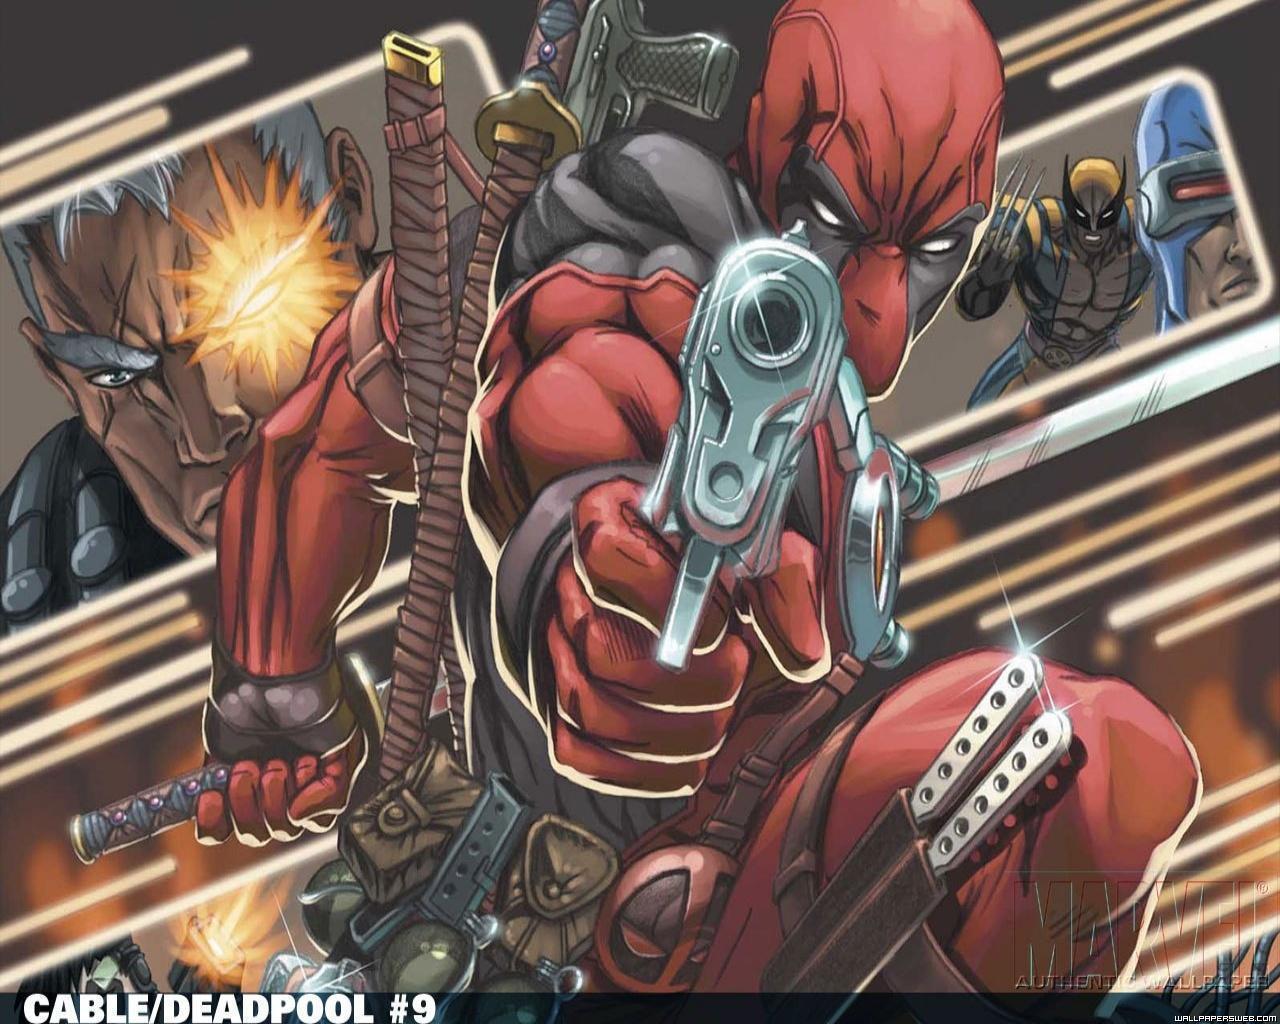 Deadpool Wallpaper 10619193 1280 1024jpg 1280x1024